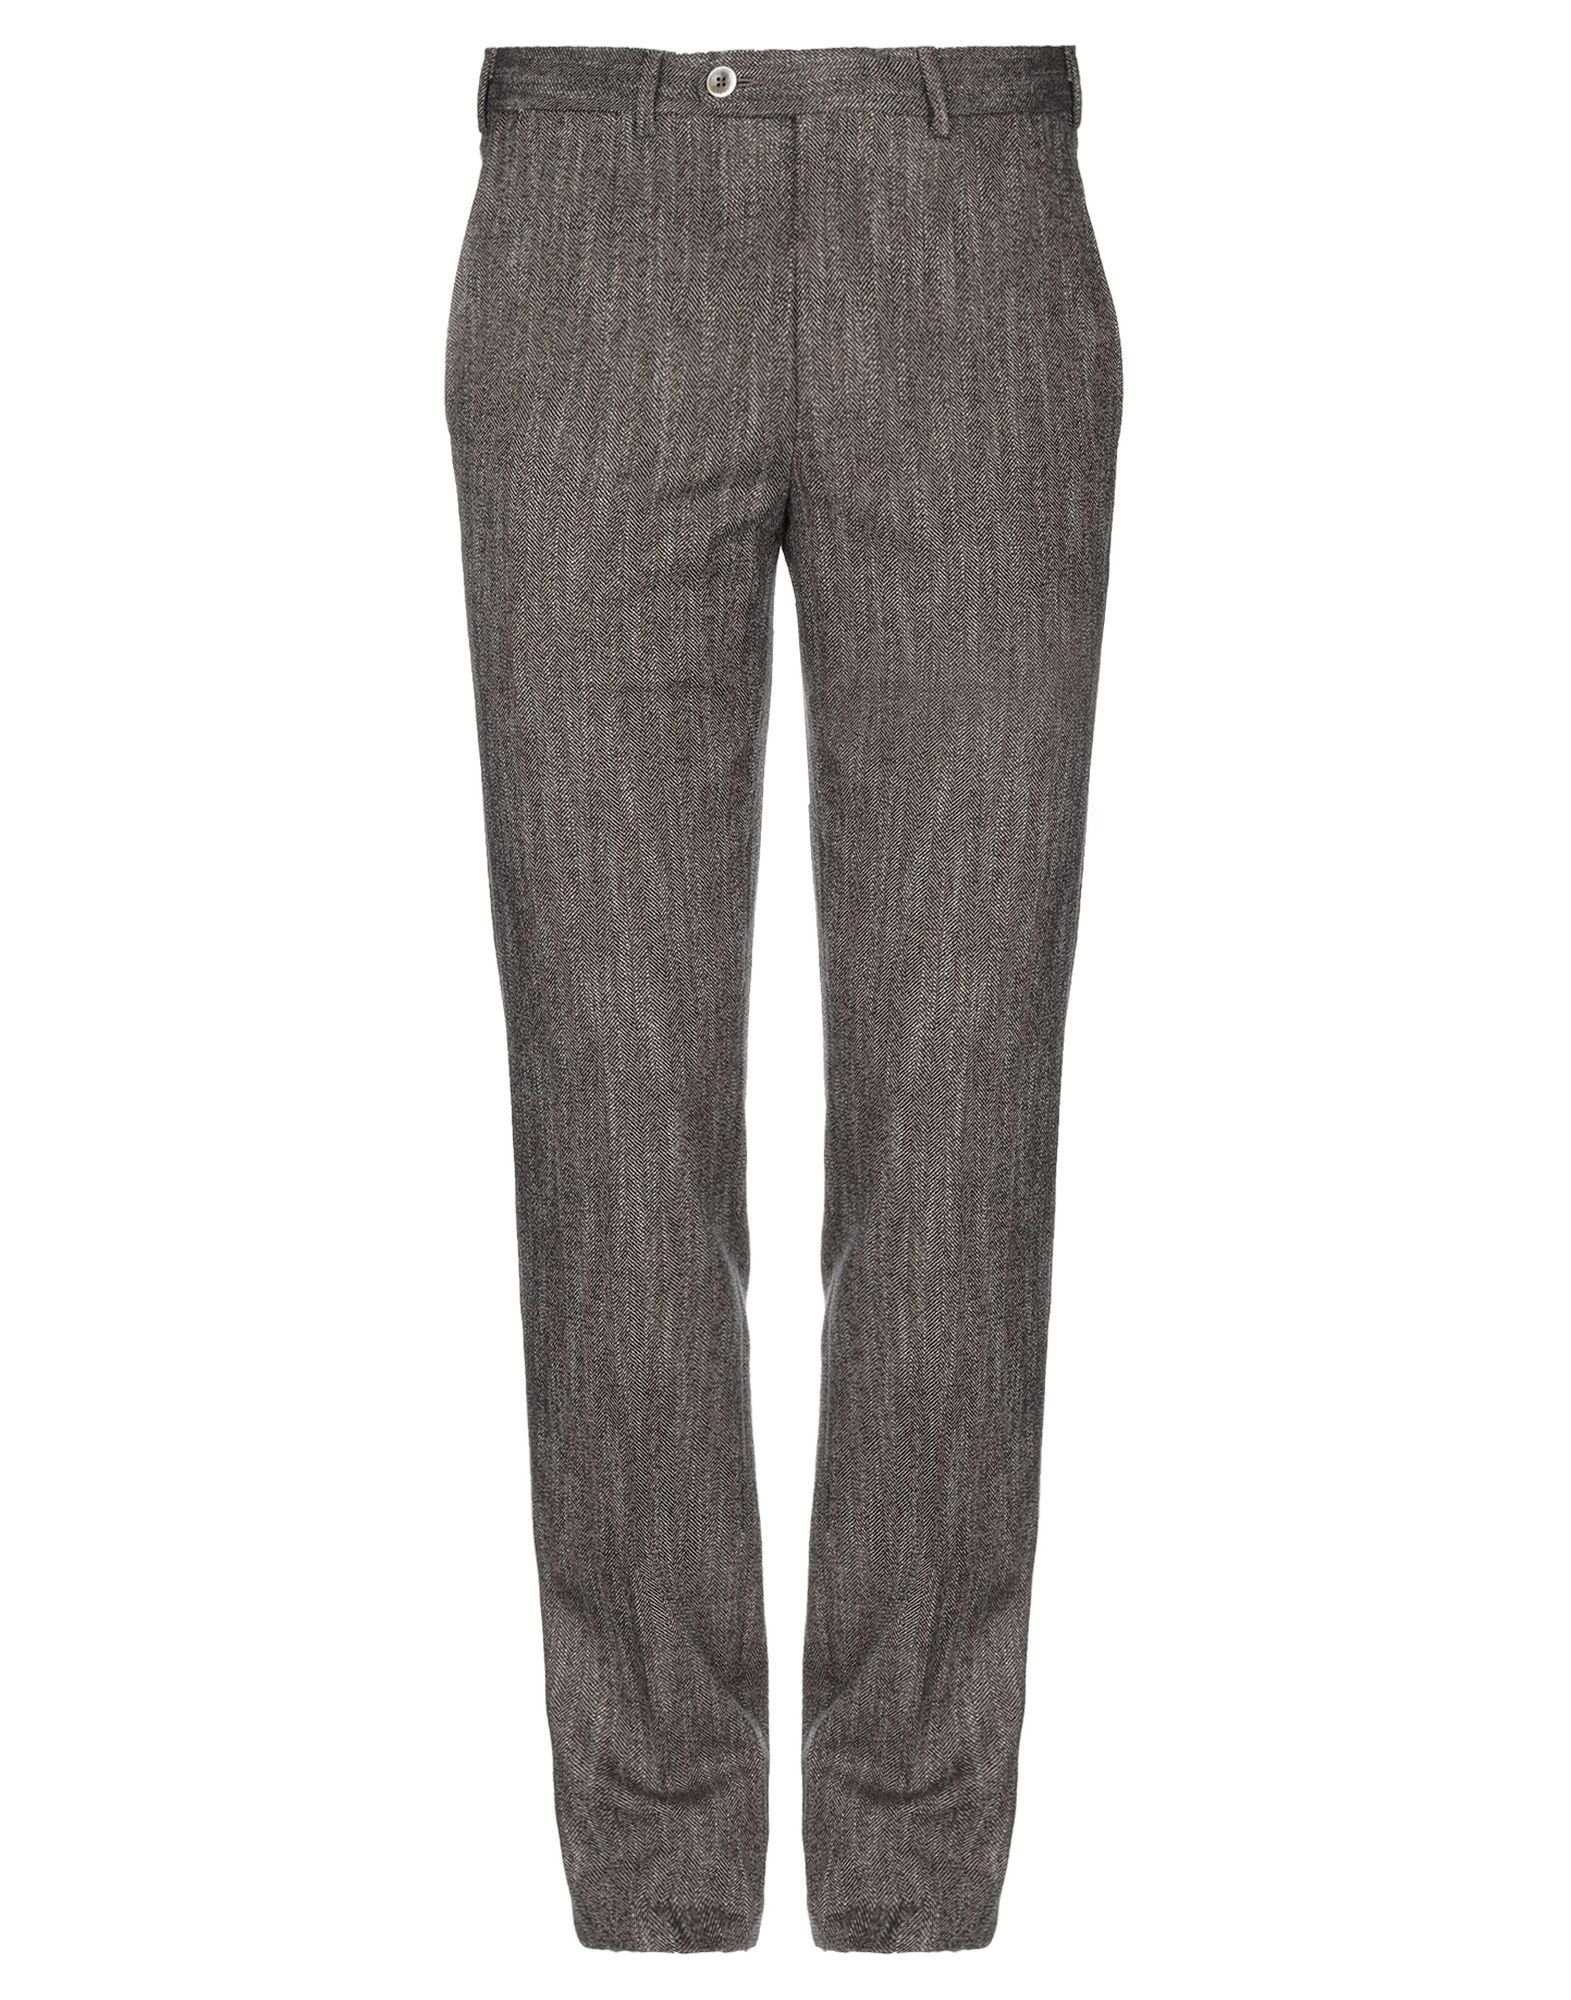 Pantalone Gta Il Pantalone herren - 13290191AX